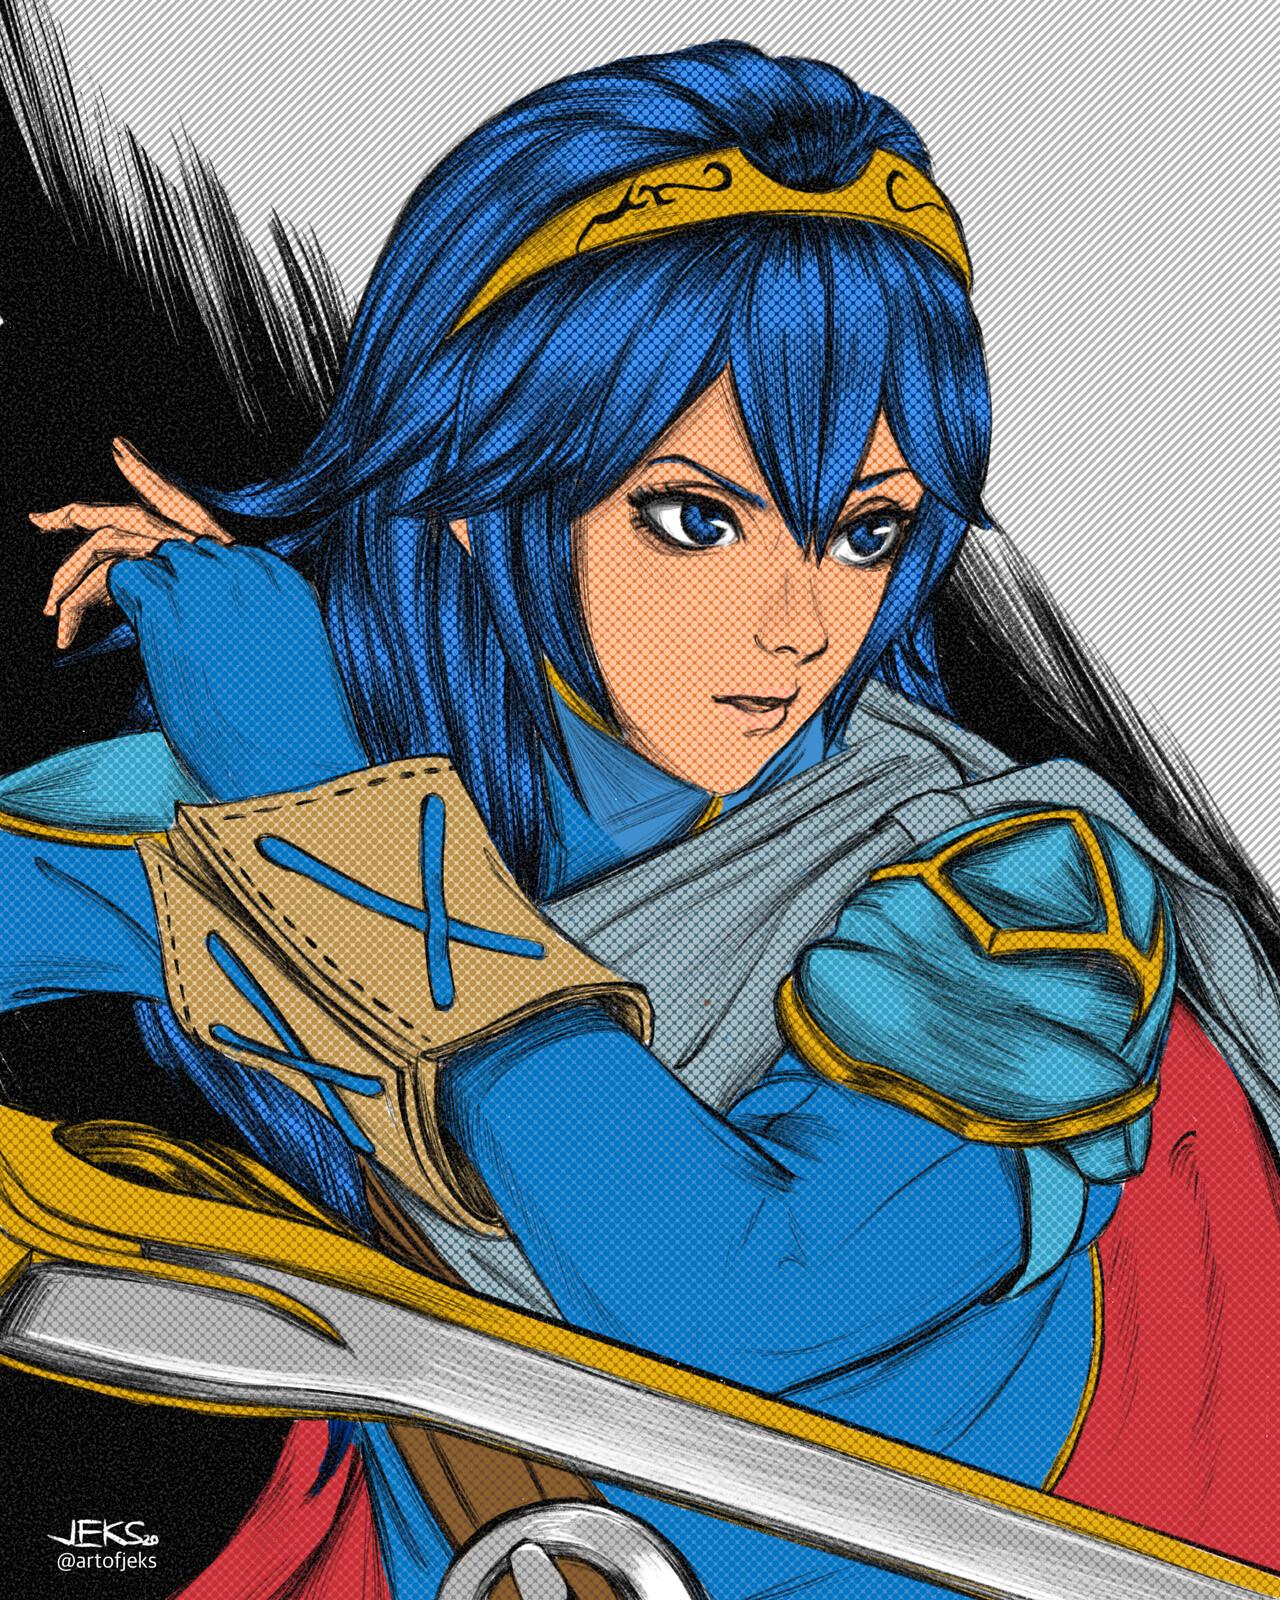 23 - Lucina of Fire Emblem Awakening